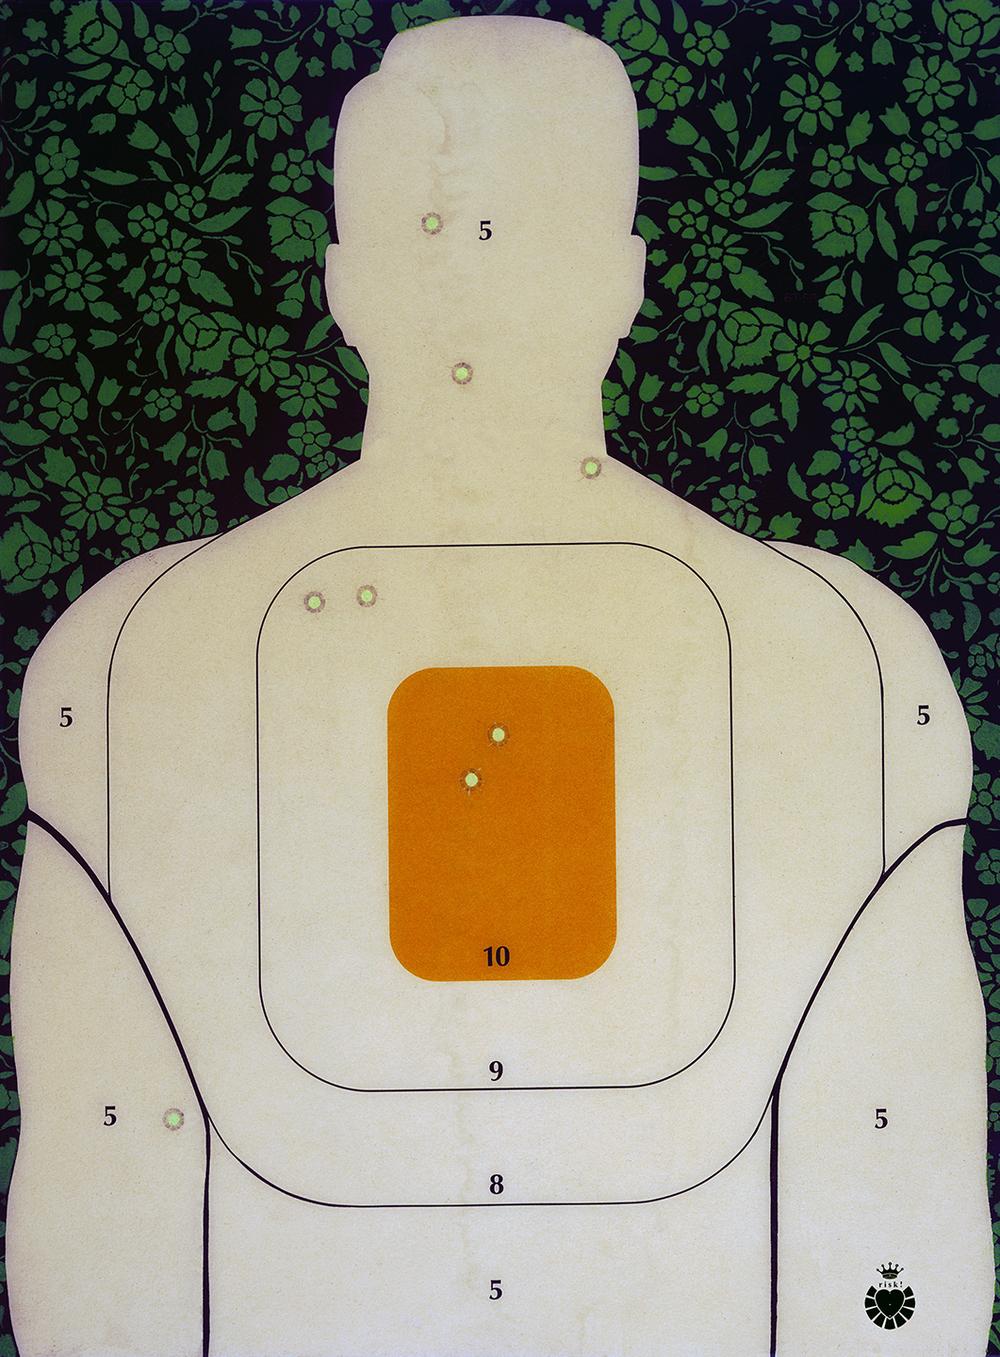 Hank's Training Target / Original Sold